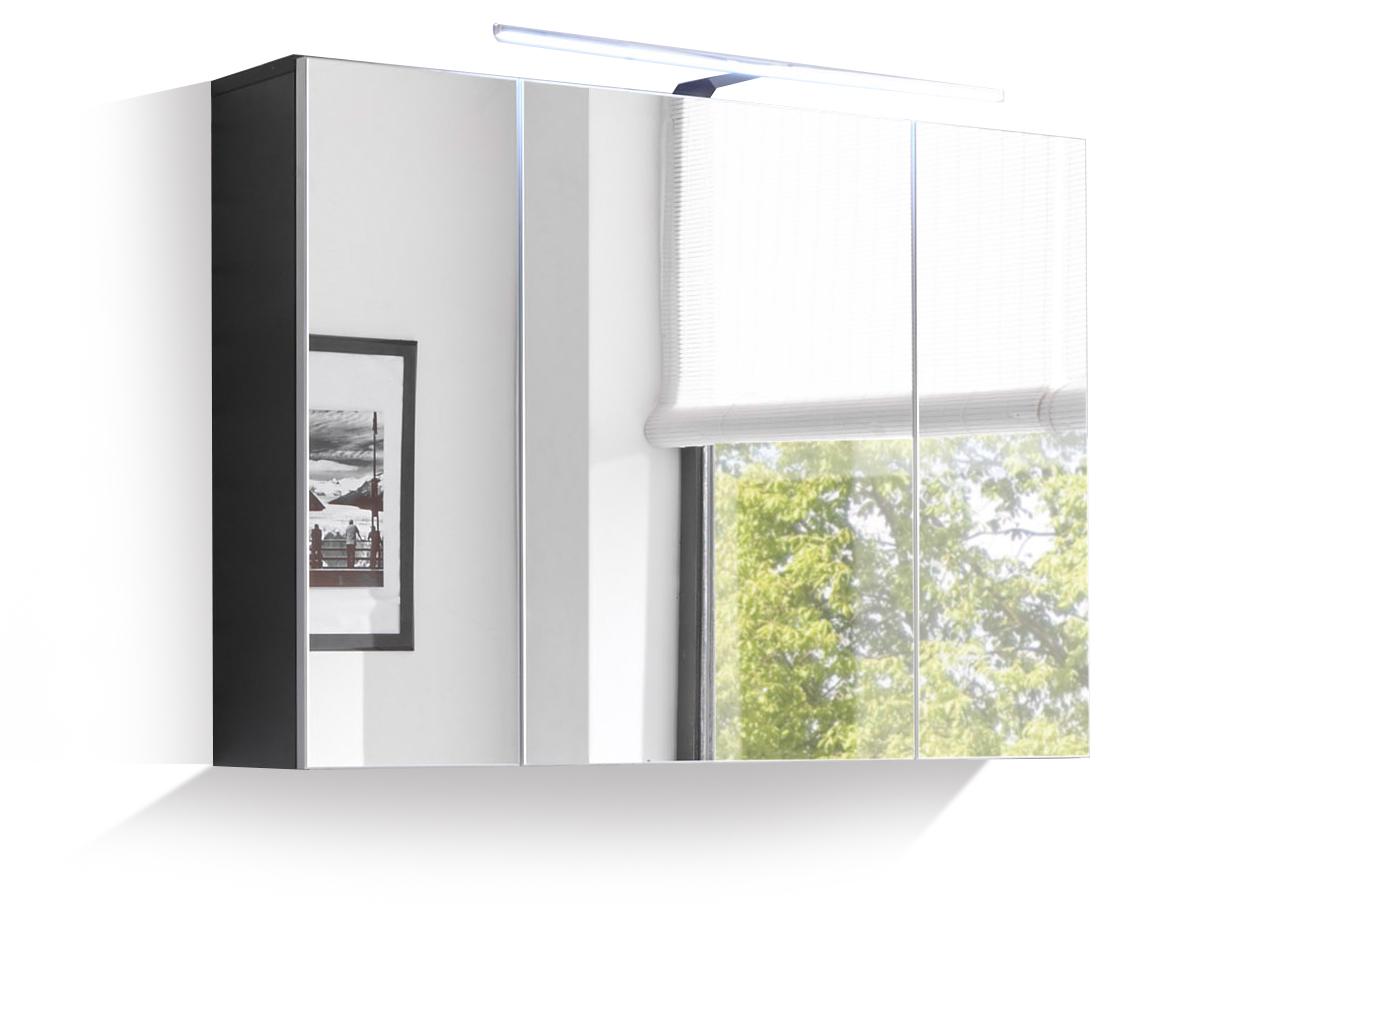 may badezimmer spiegelschrank inkl led spiegel badschrank badm bel wei grau ebay. Black Bedroom Furniture Sets. Home Design Ideas